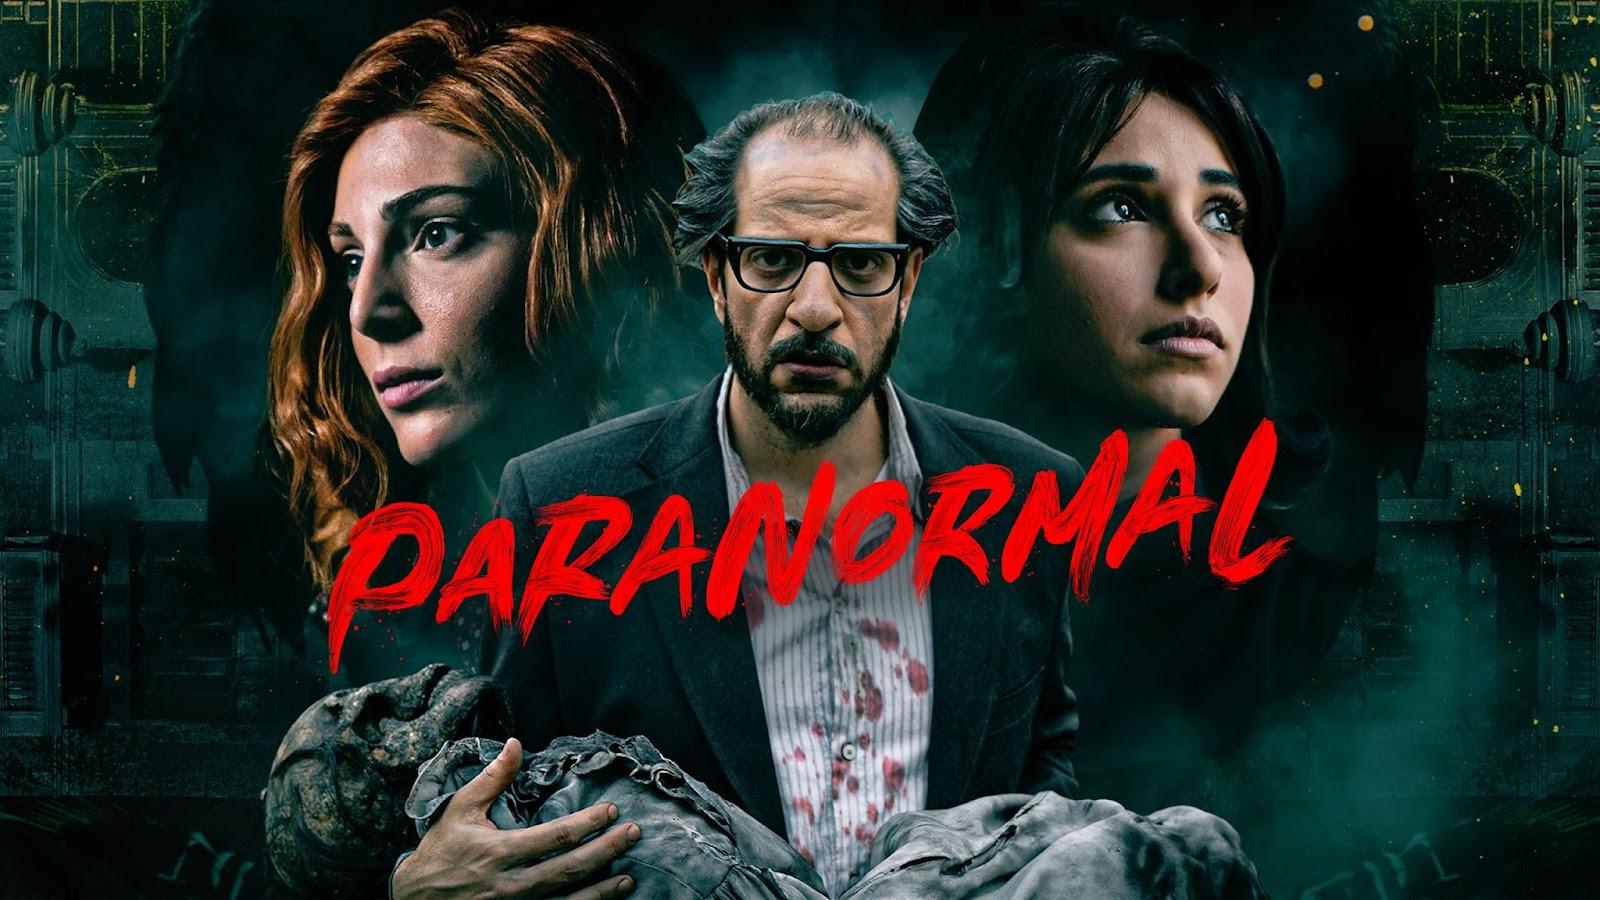 Paranormal Netflix